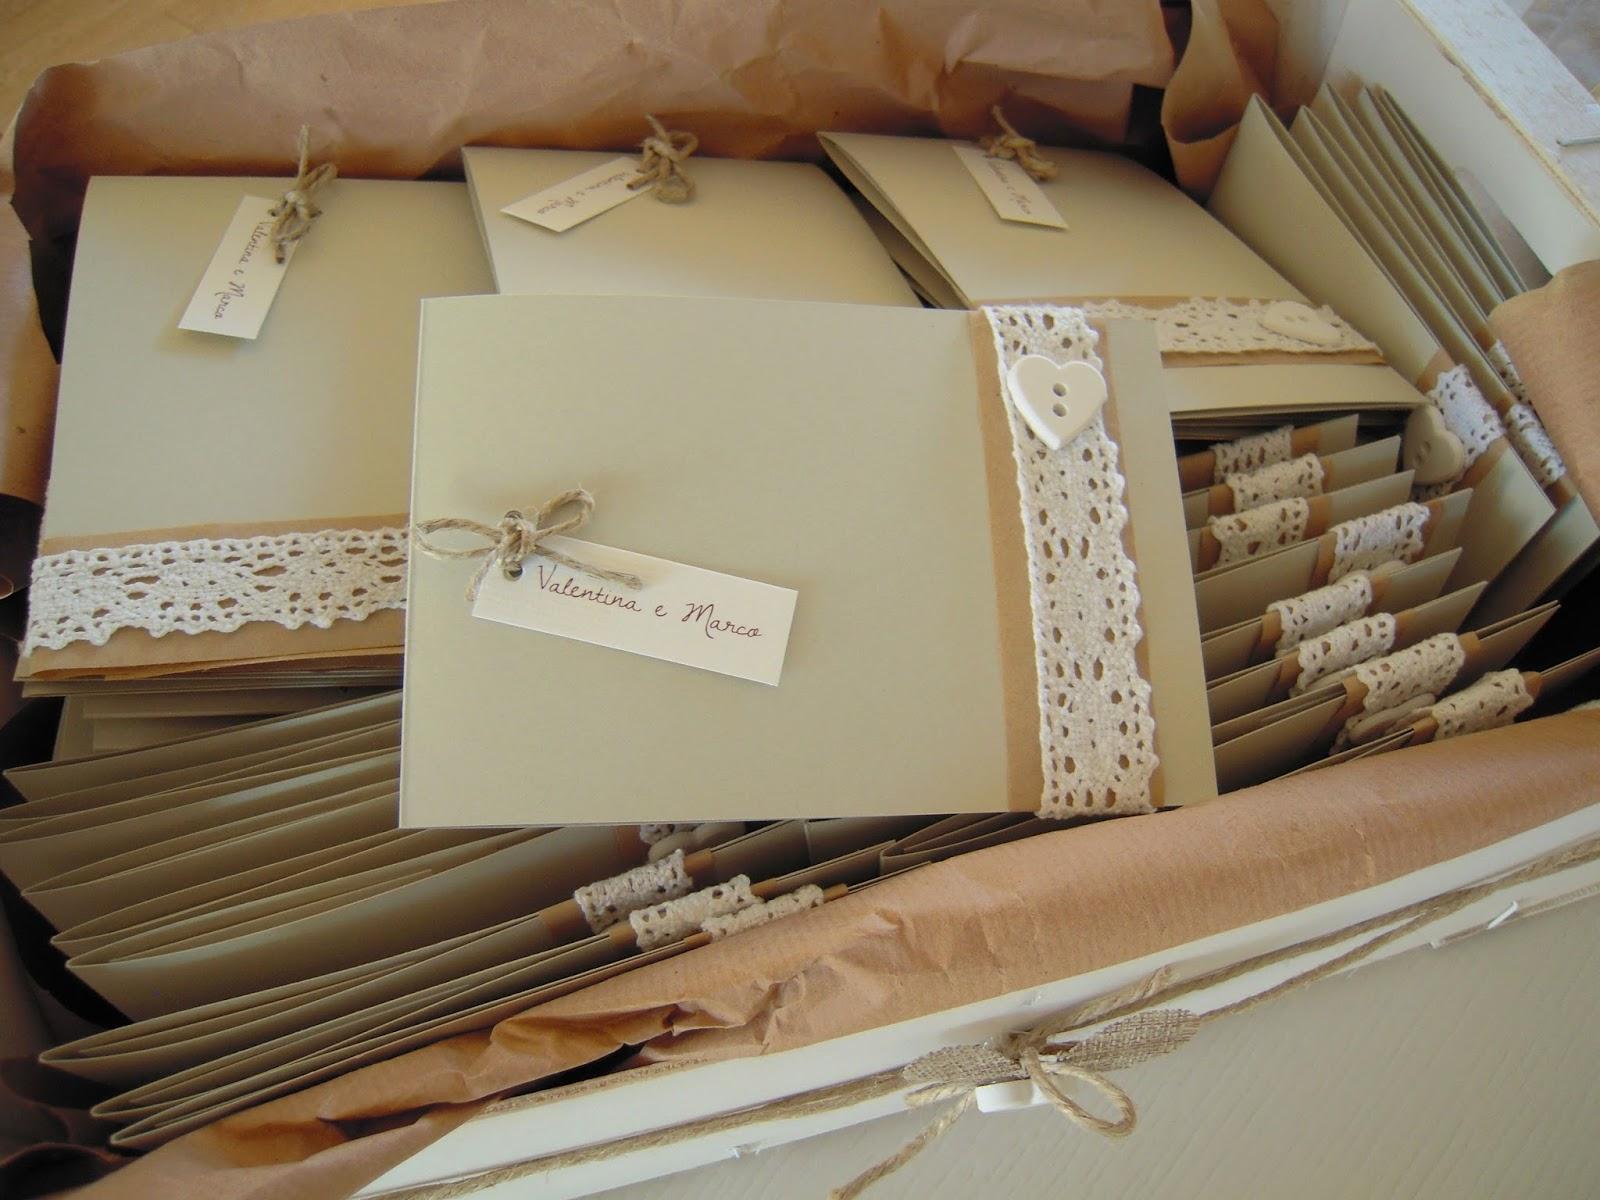 Partecipazioni Matrimonio Scrapbooking.Robertarobilandia Creazioni Artigianali Partecipazioni Matrimonio